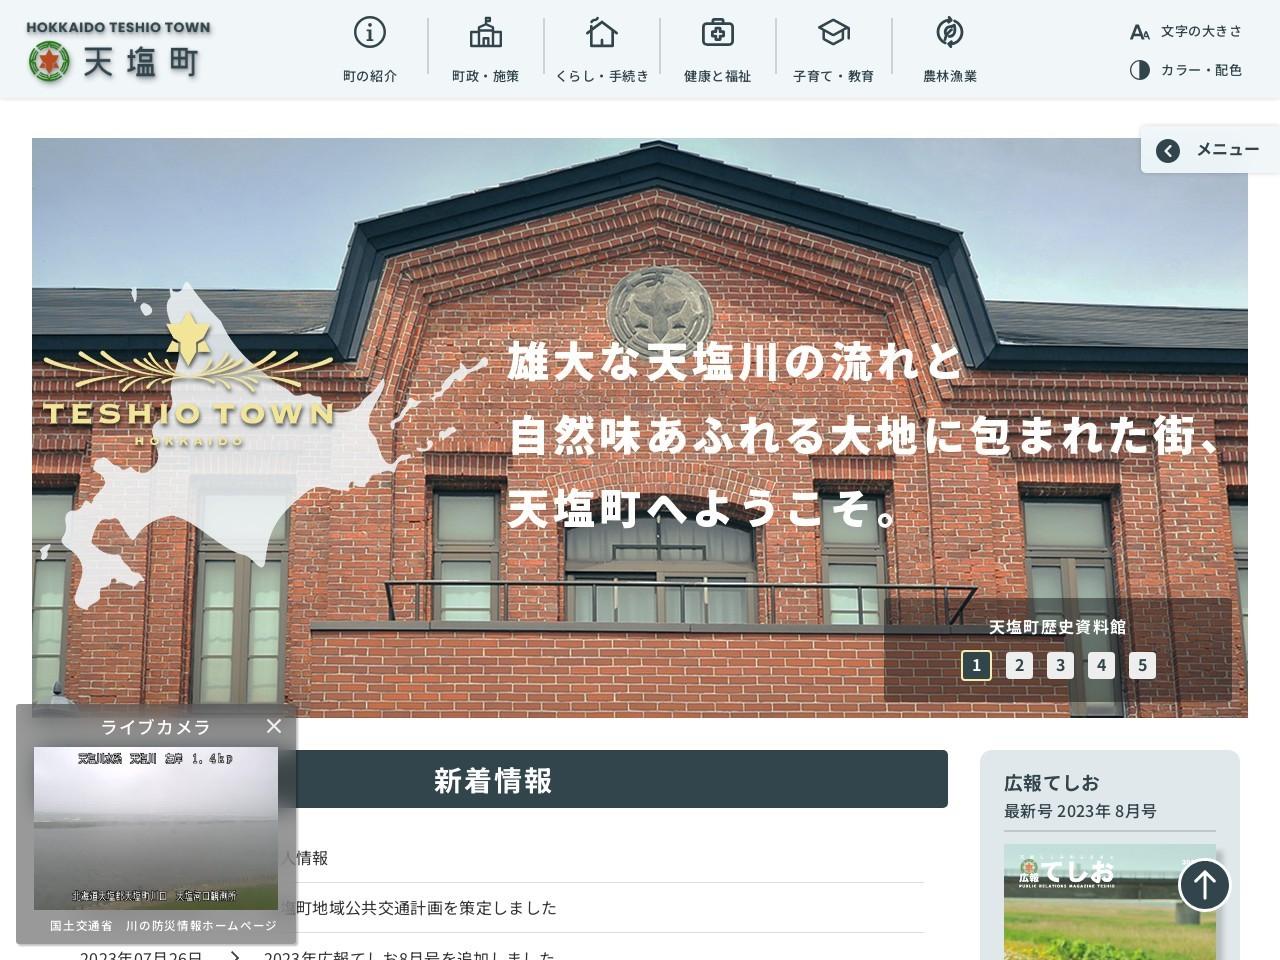 http://www.teshiotown.hokkaido.jp/